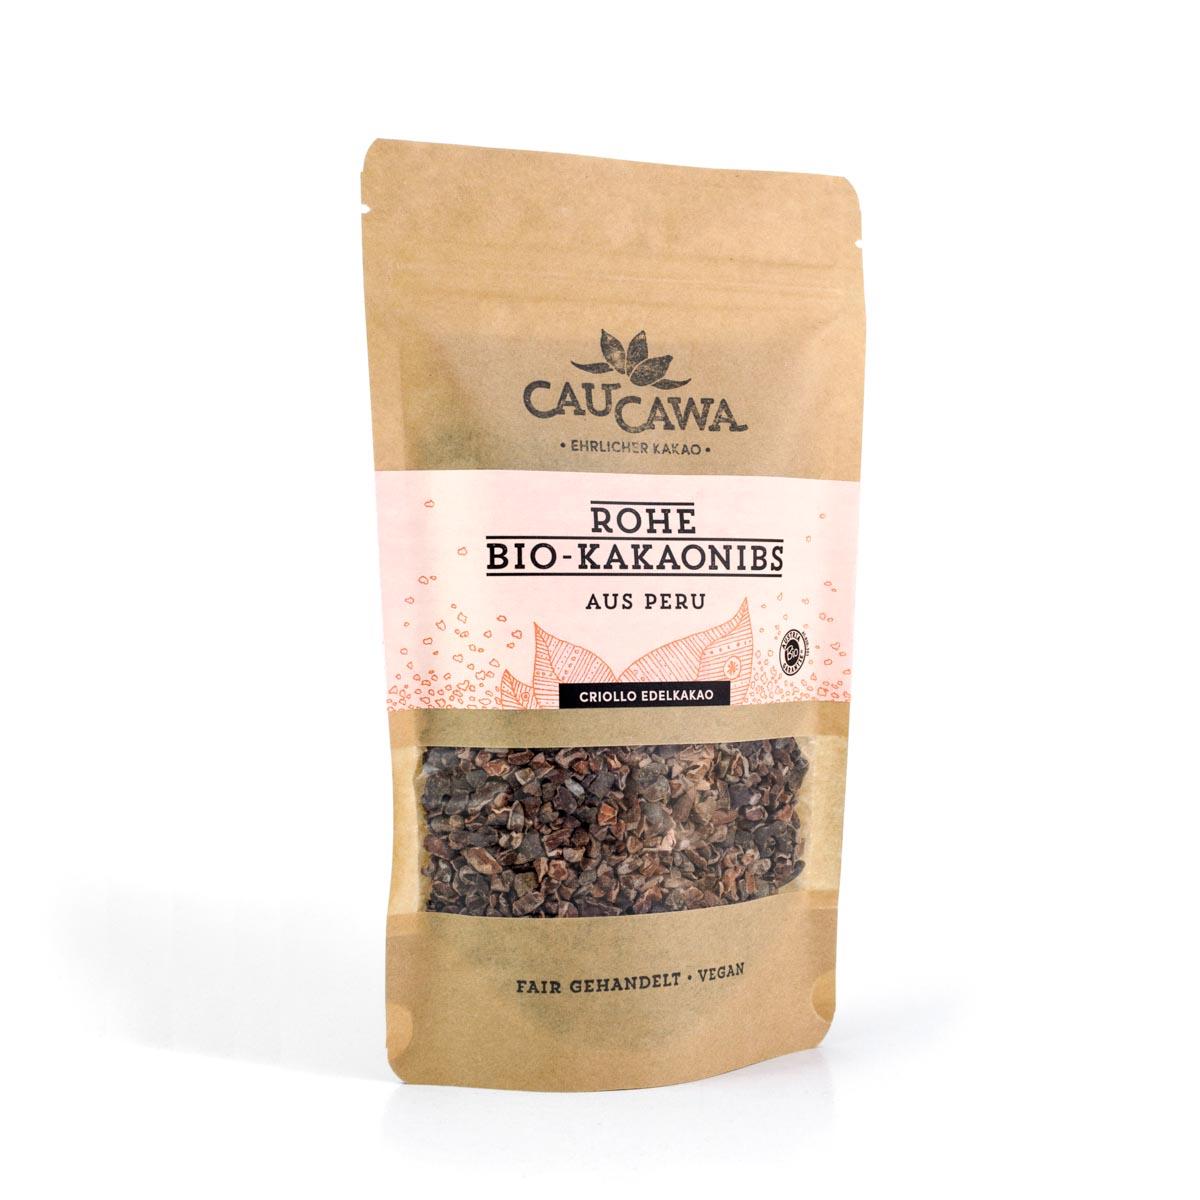 BIO Kakaonibs aus Peru